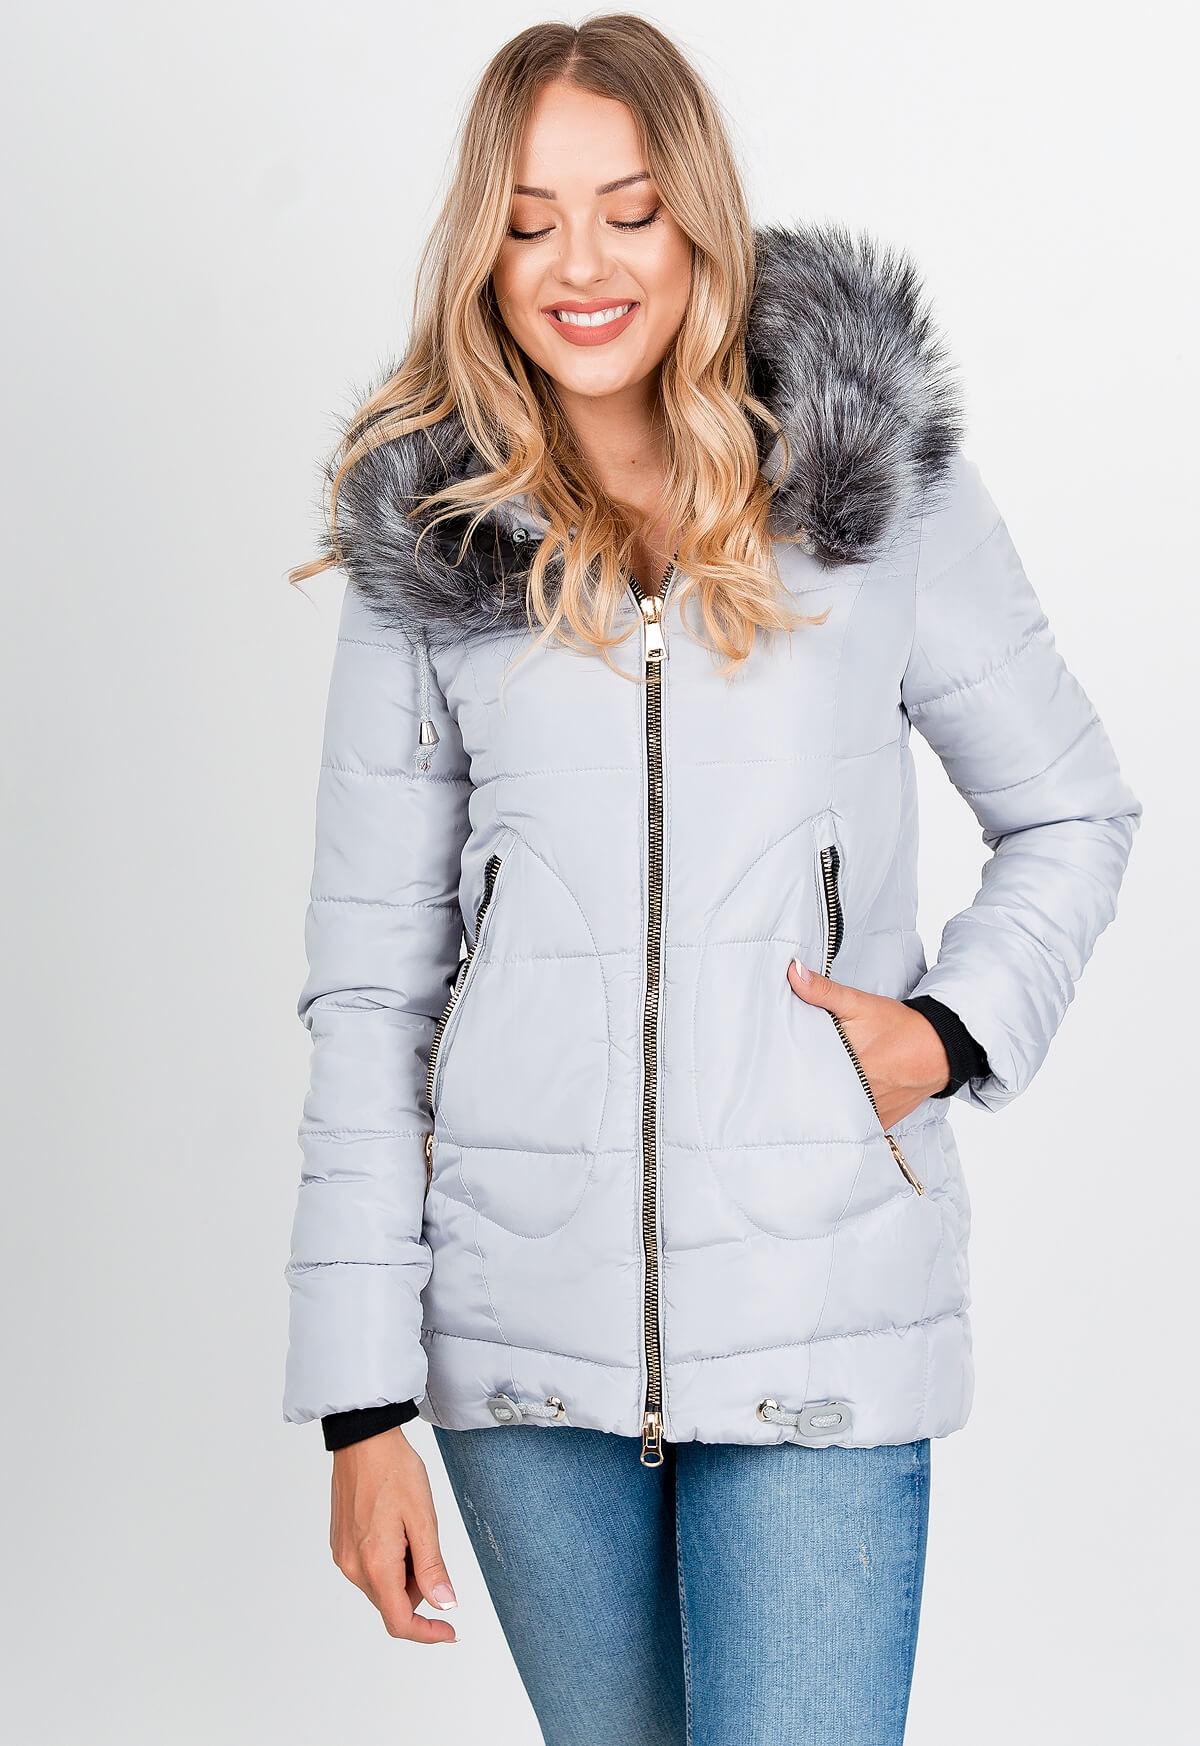 Dámska sivá zimná bunda s kapucňou - XXL